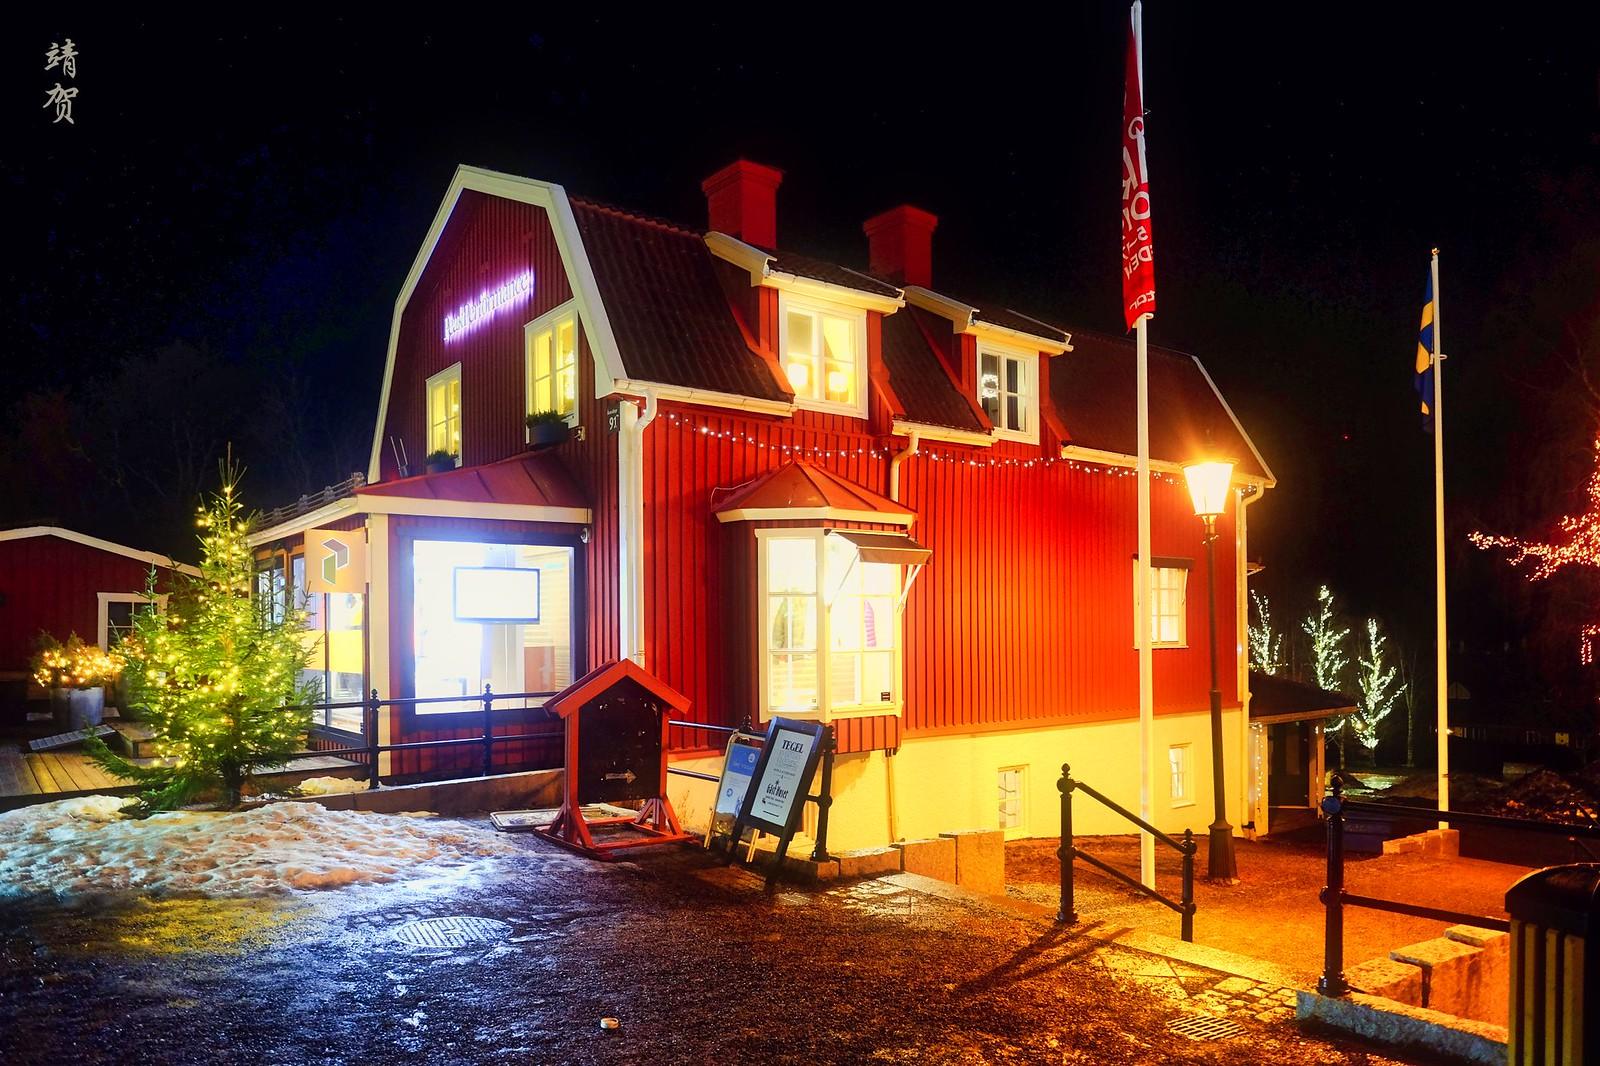 Red barn shop